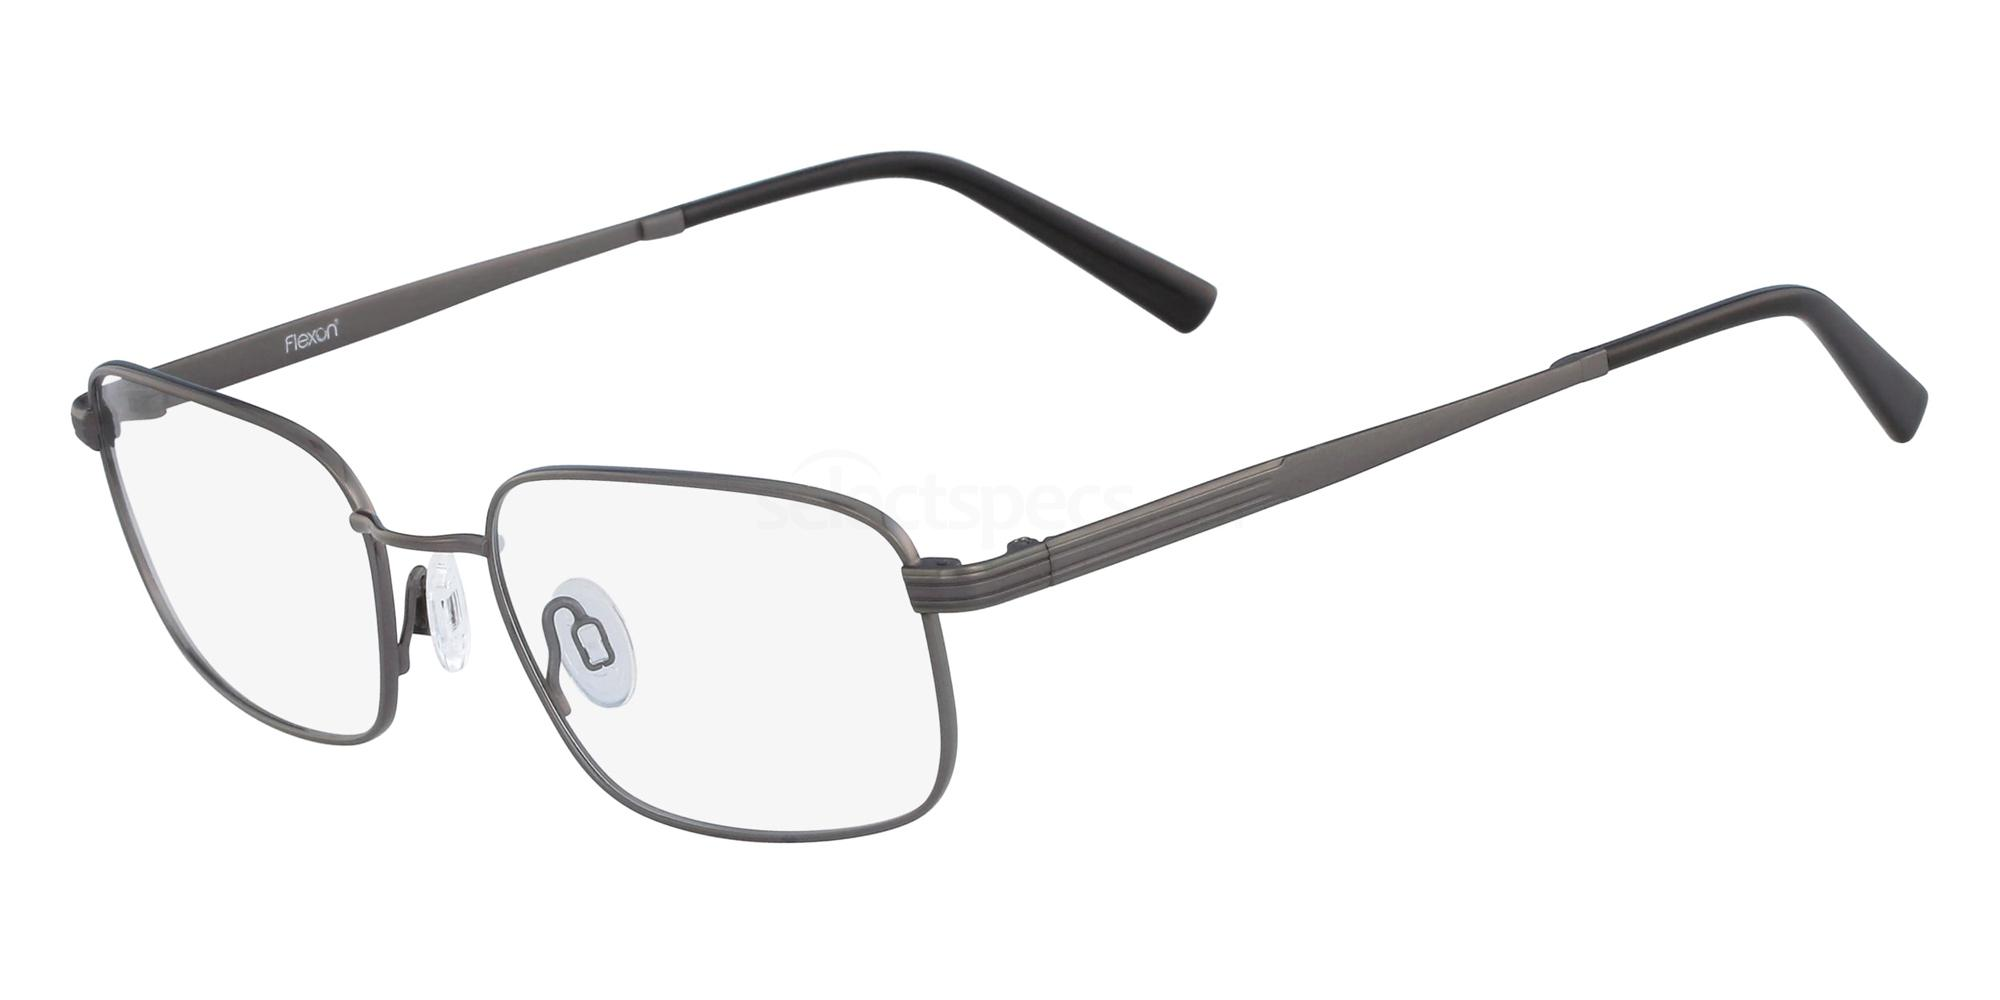 033 FLEXON COLLINS 600 Glasses, Flexon